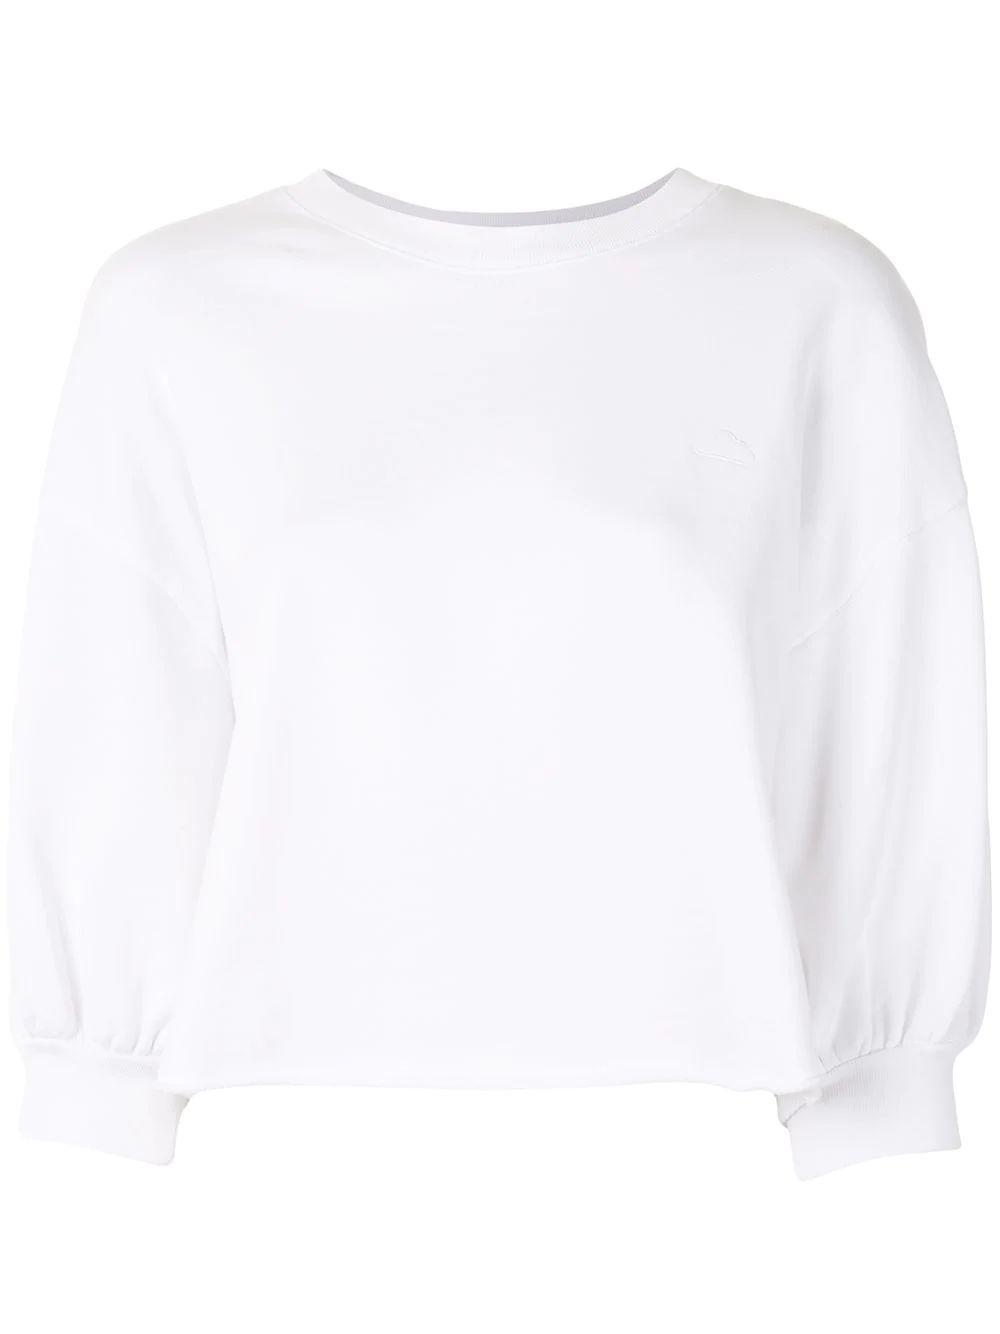 Swingy Sweatshirt Item # LWAC0359